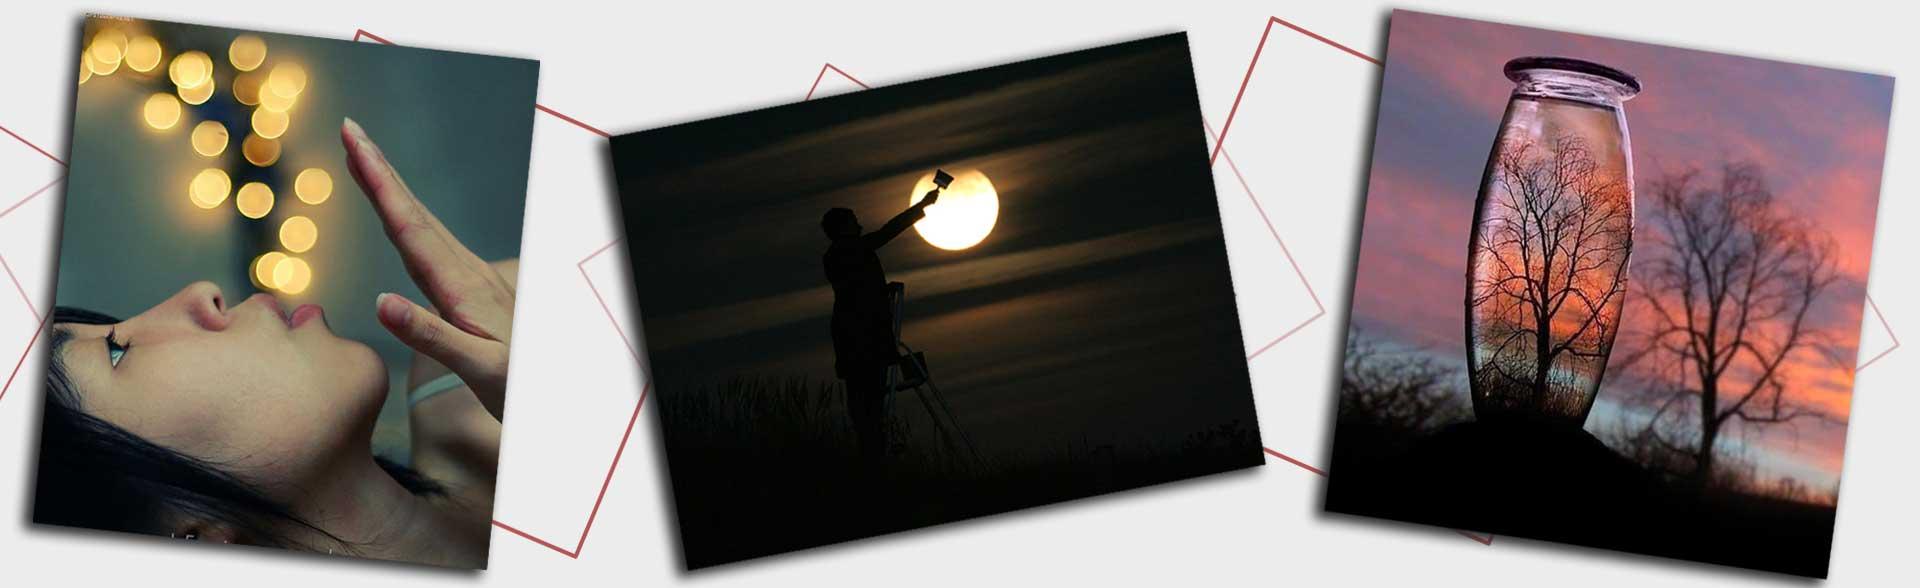 Creative photography 9 - اهمیت خلاقیت در عکاسی